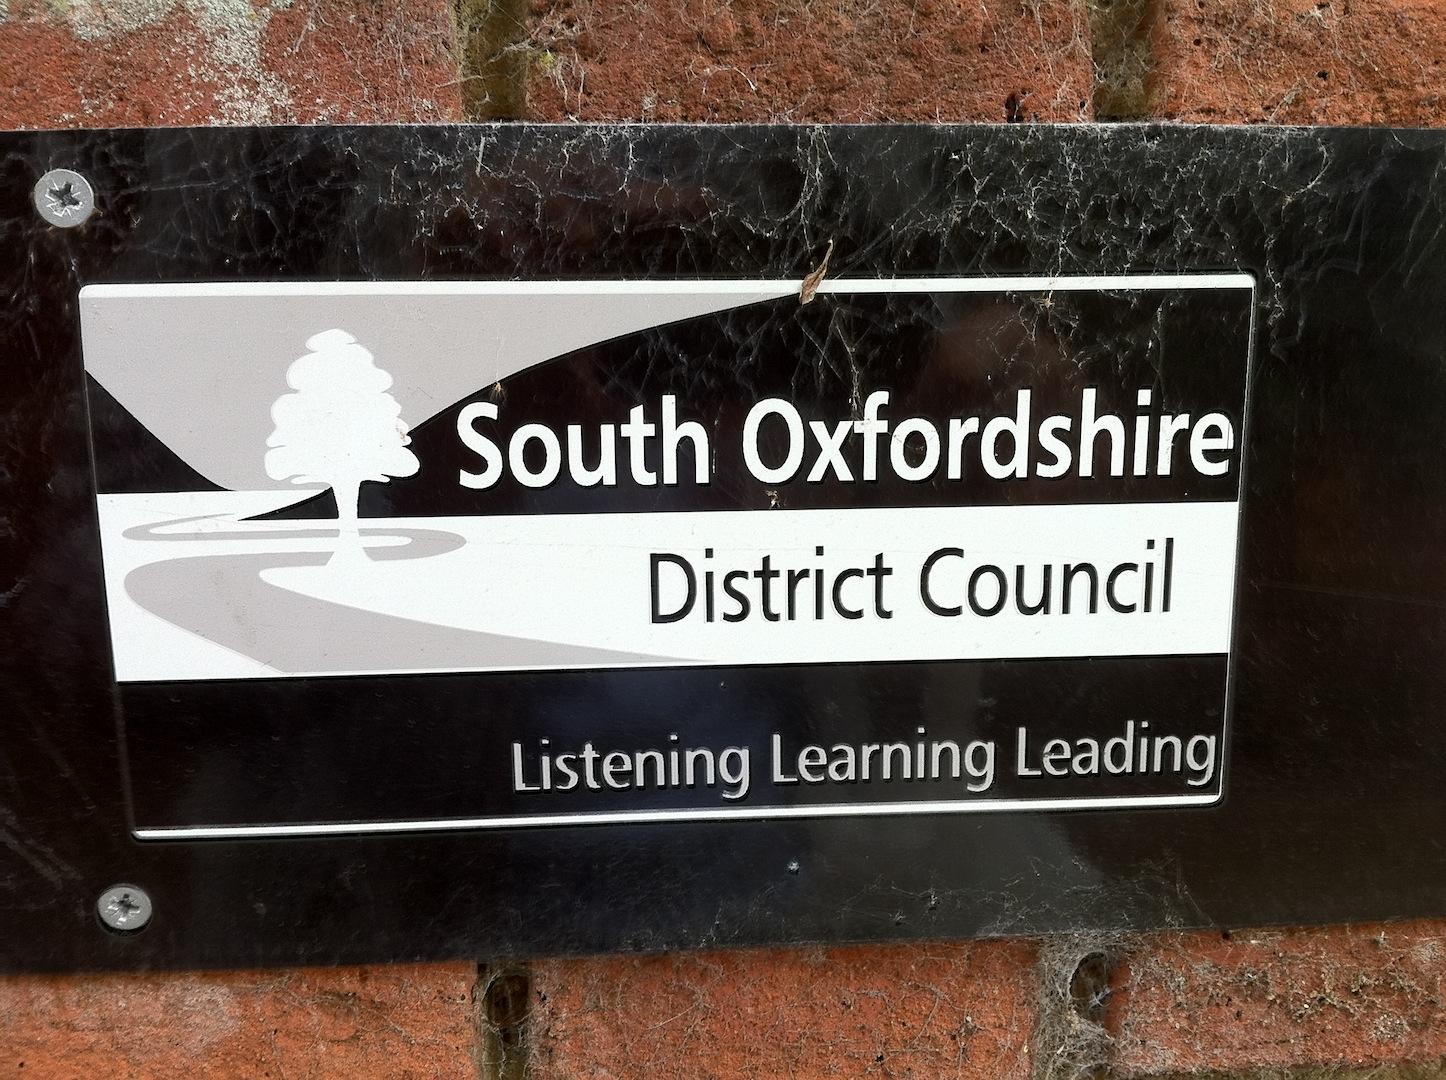 Listening Learning Leading